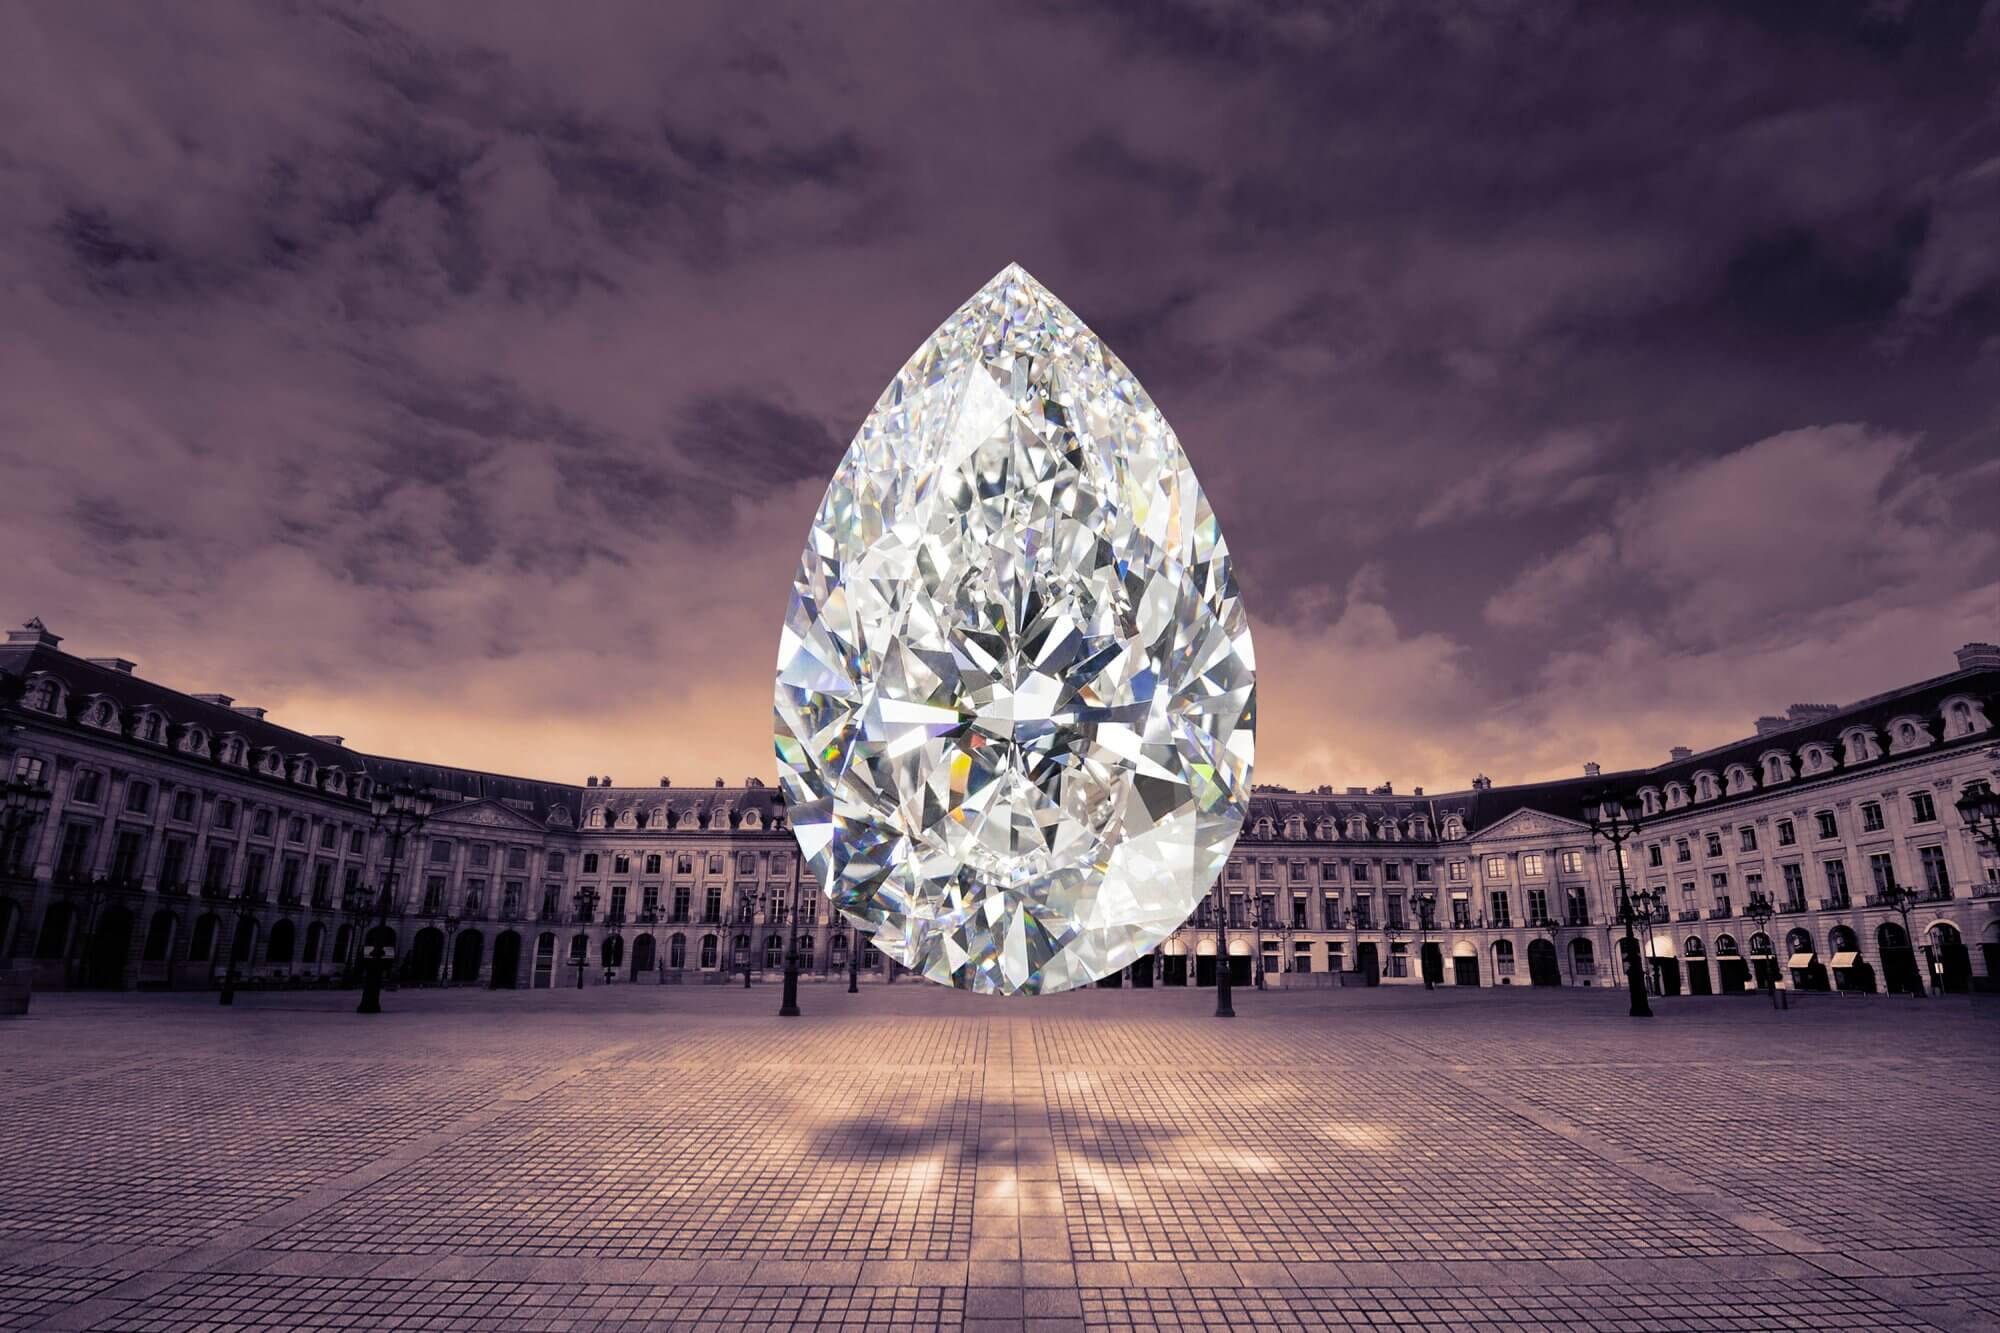 The Graff Vendôme pear shape famous diamond with the Place Vendôme in Paris, France as the background